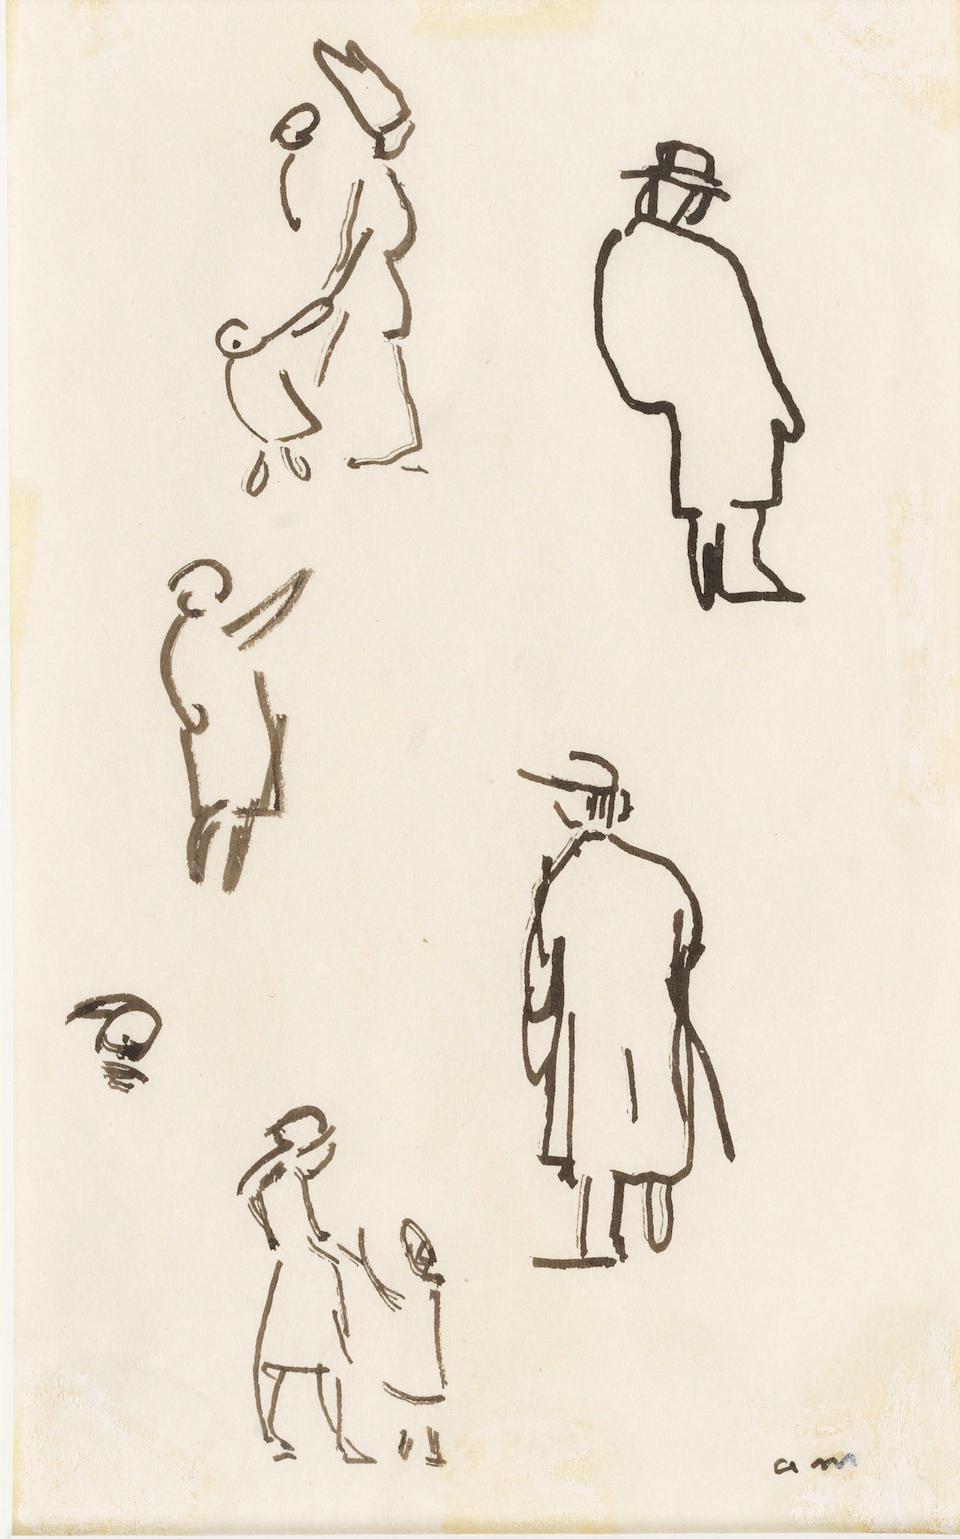 Albert  Marquet (1875-1947) Extrait du carnet de croquis (recto); Nu (verso) 22 x 33.5cm (8 11/16 x 13 3/16in).